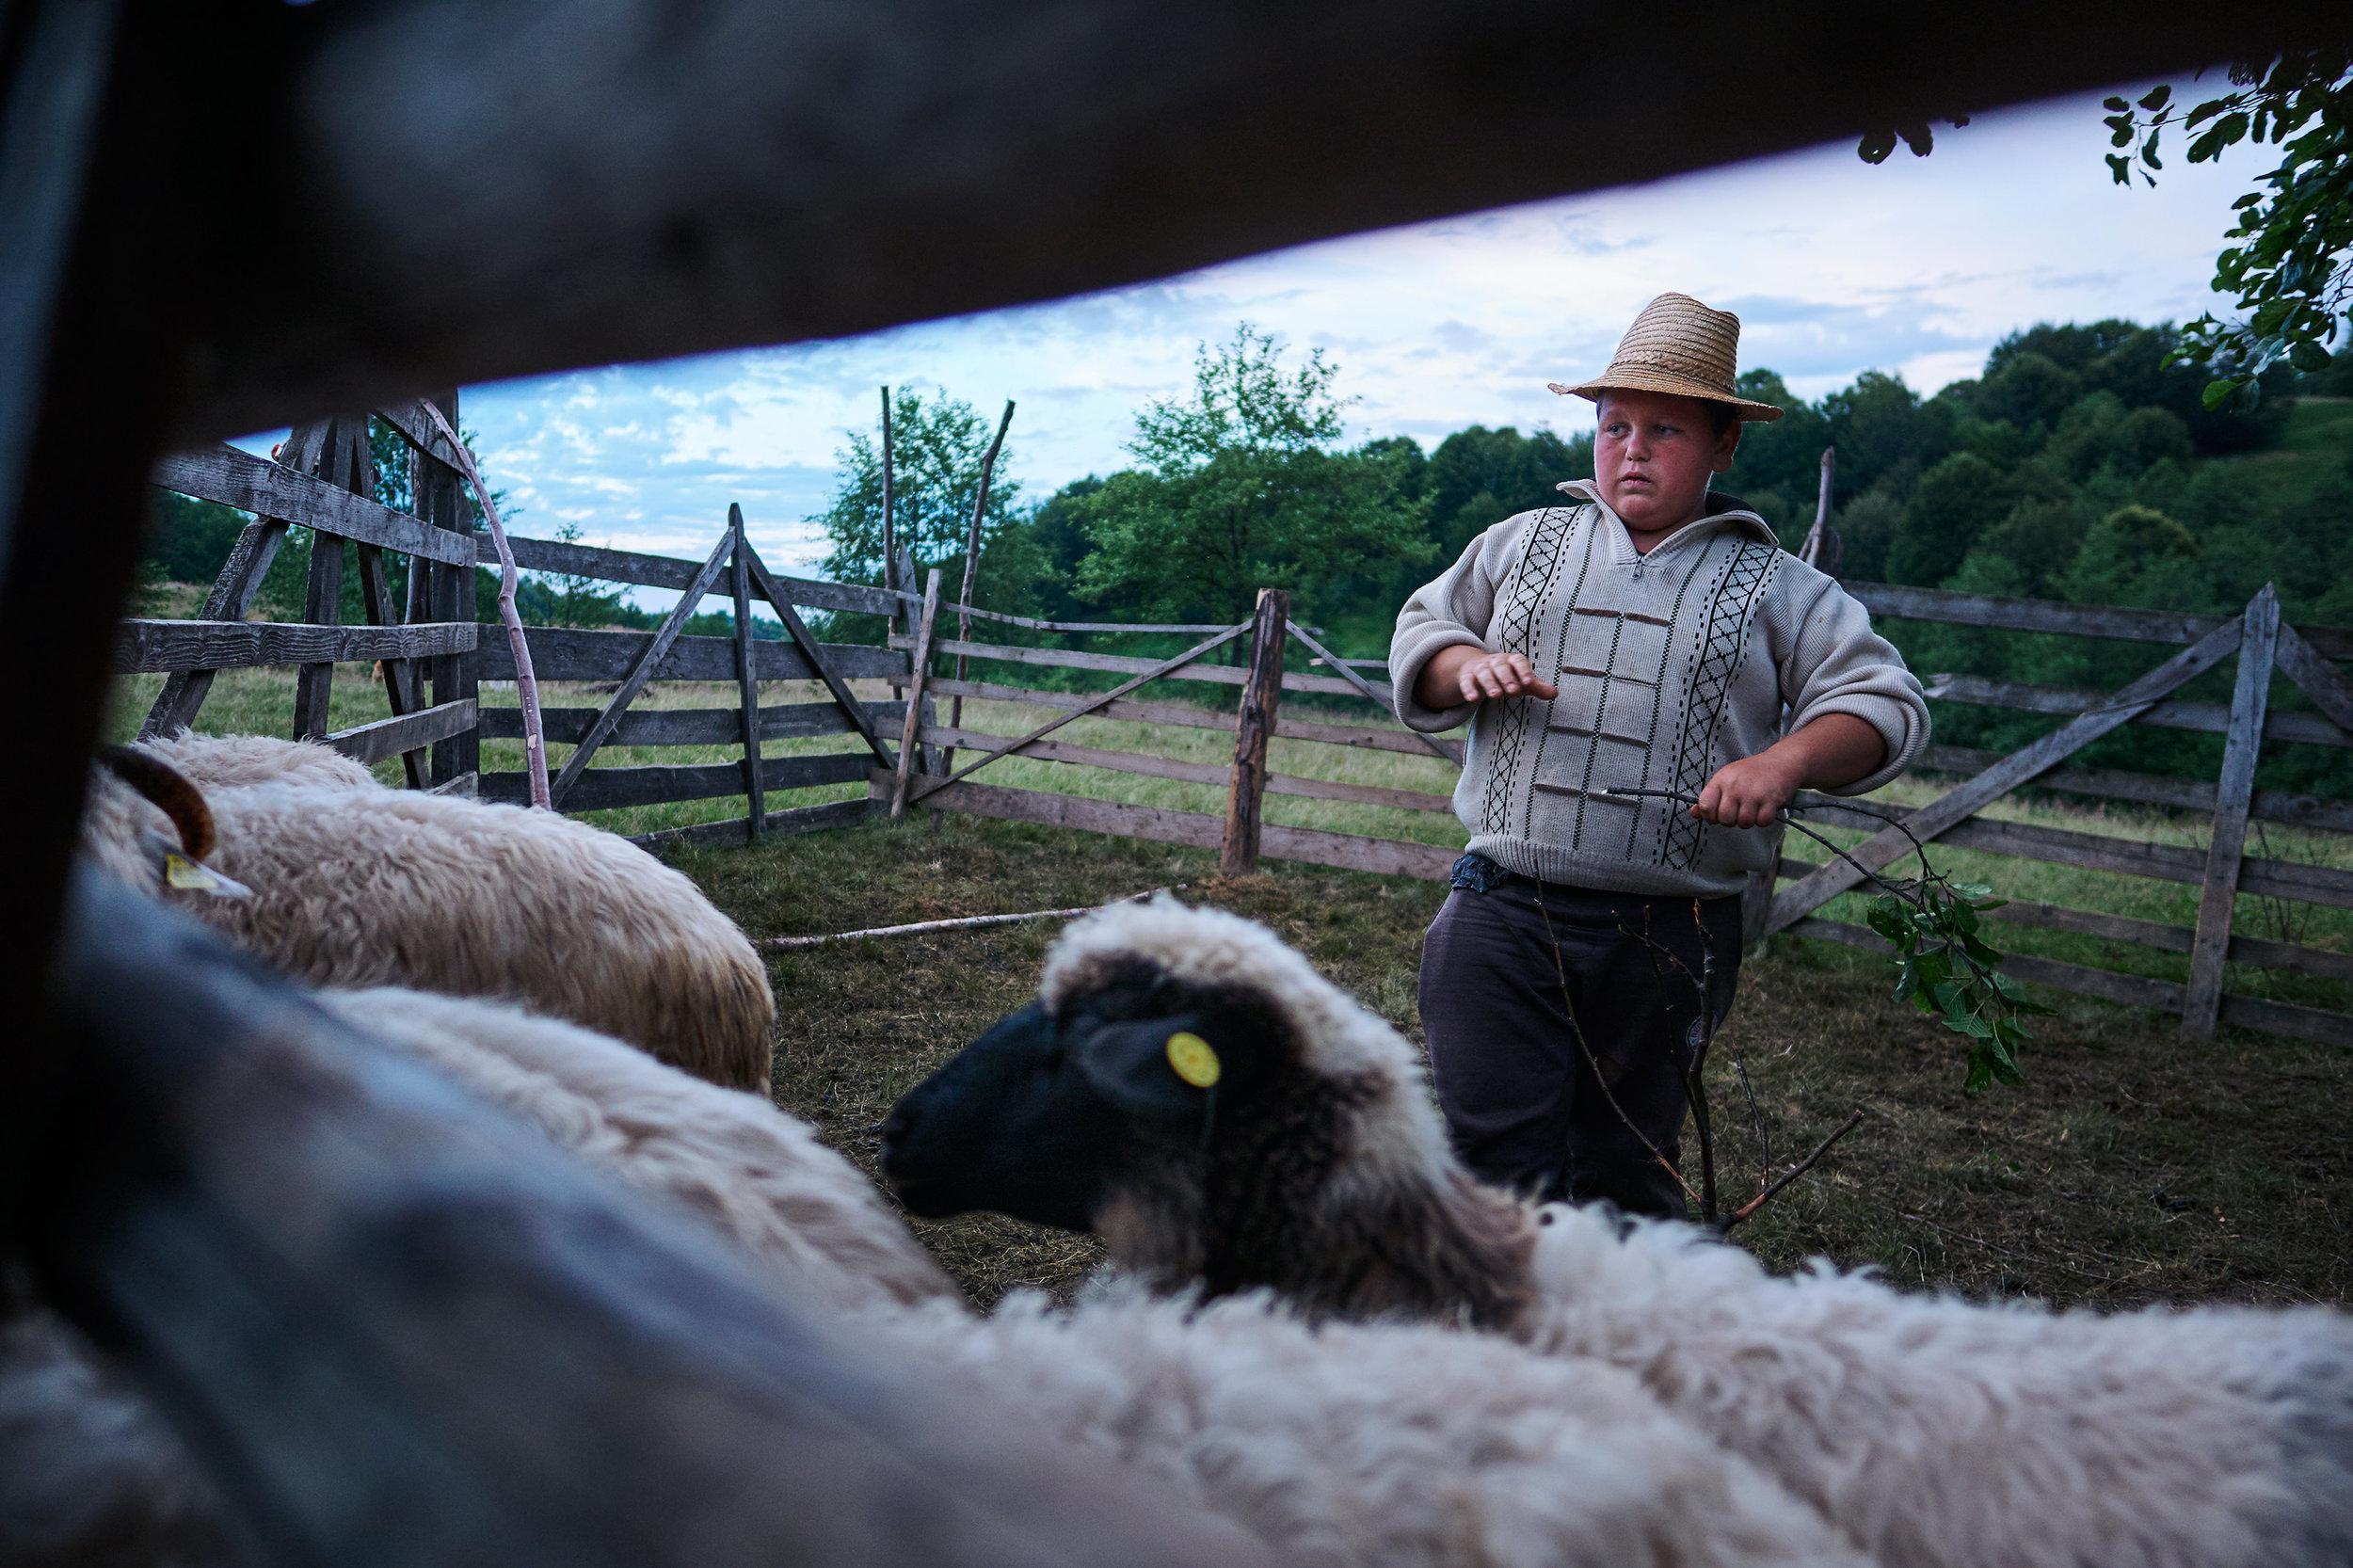 Romania-Maramures-boy-with-sheep